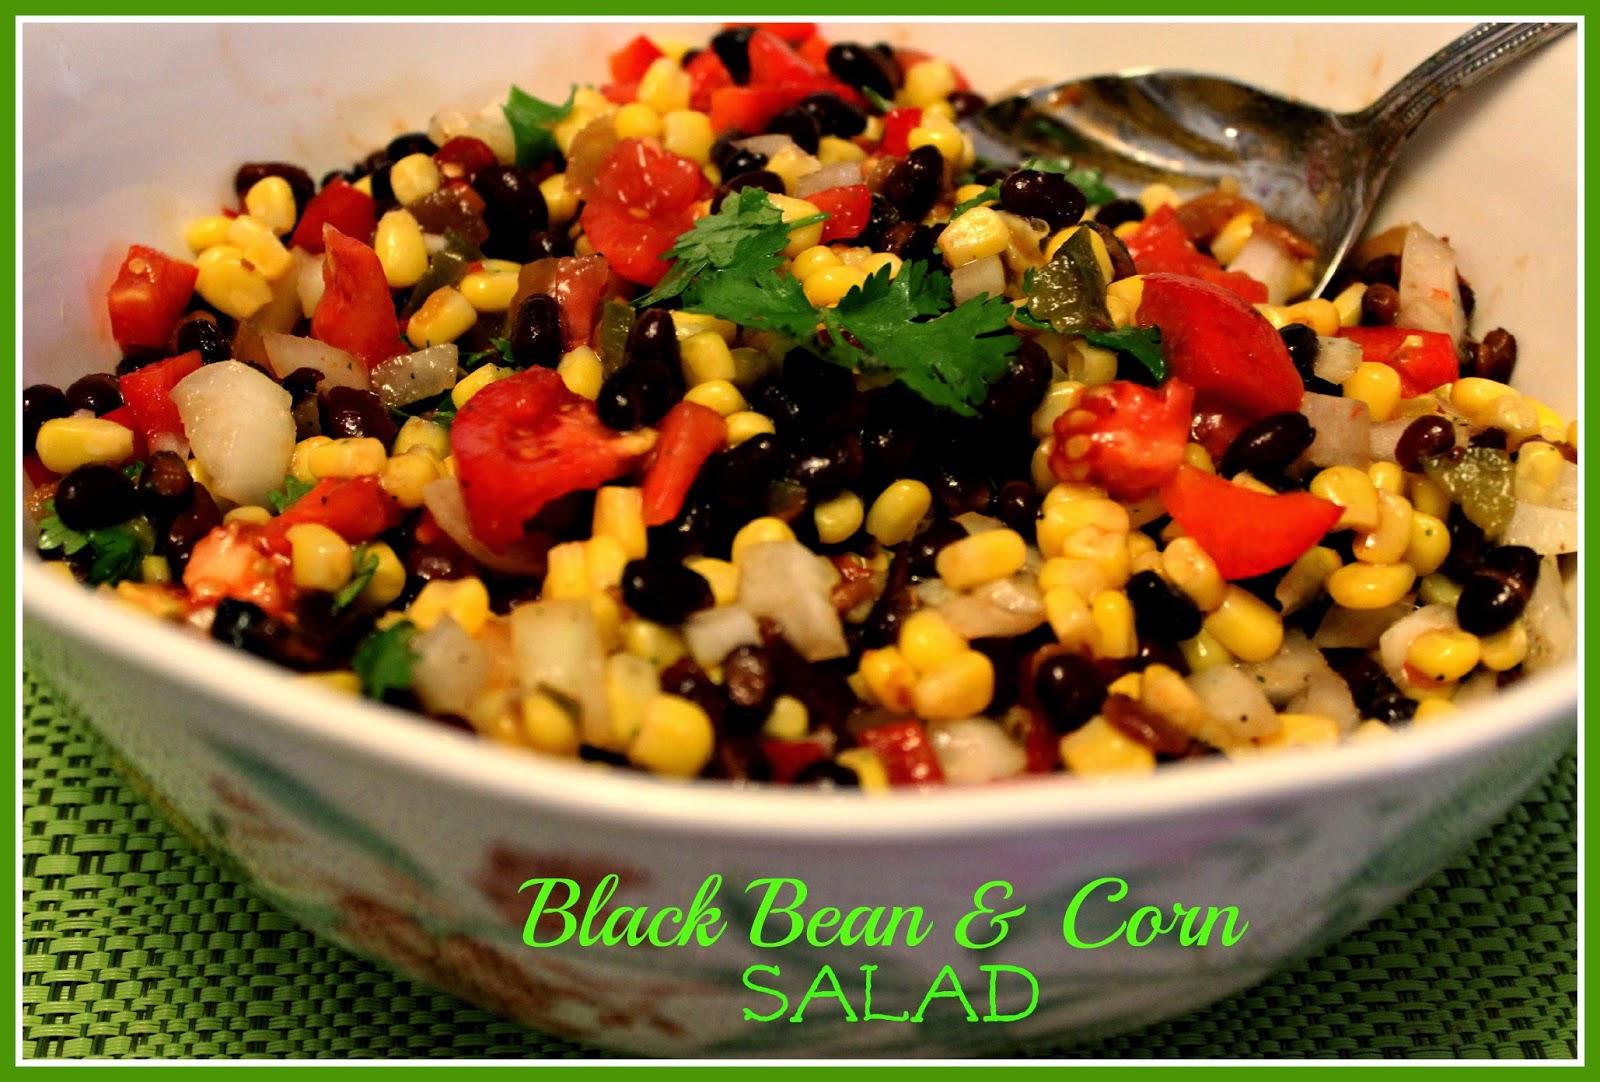 Sweet Tea and Cornbread: Black Bean and Corn Salad!